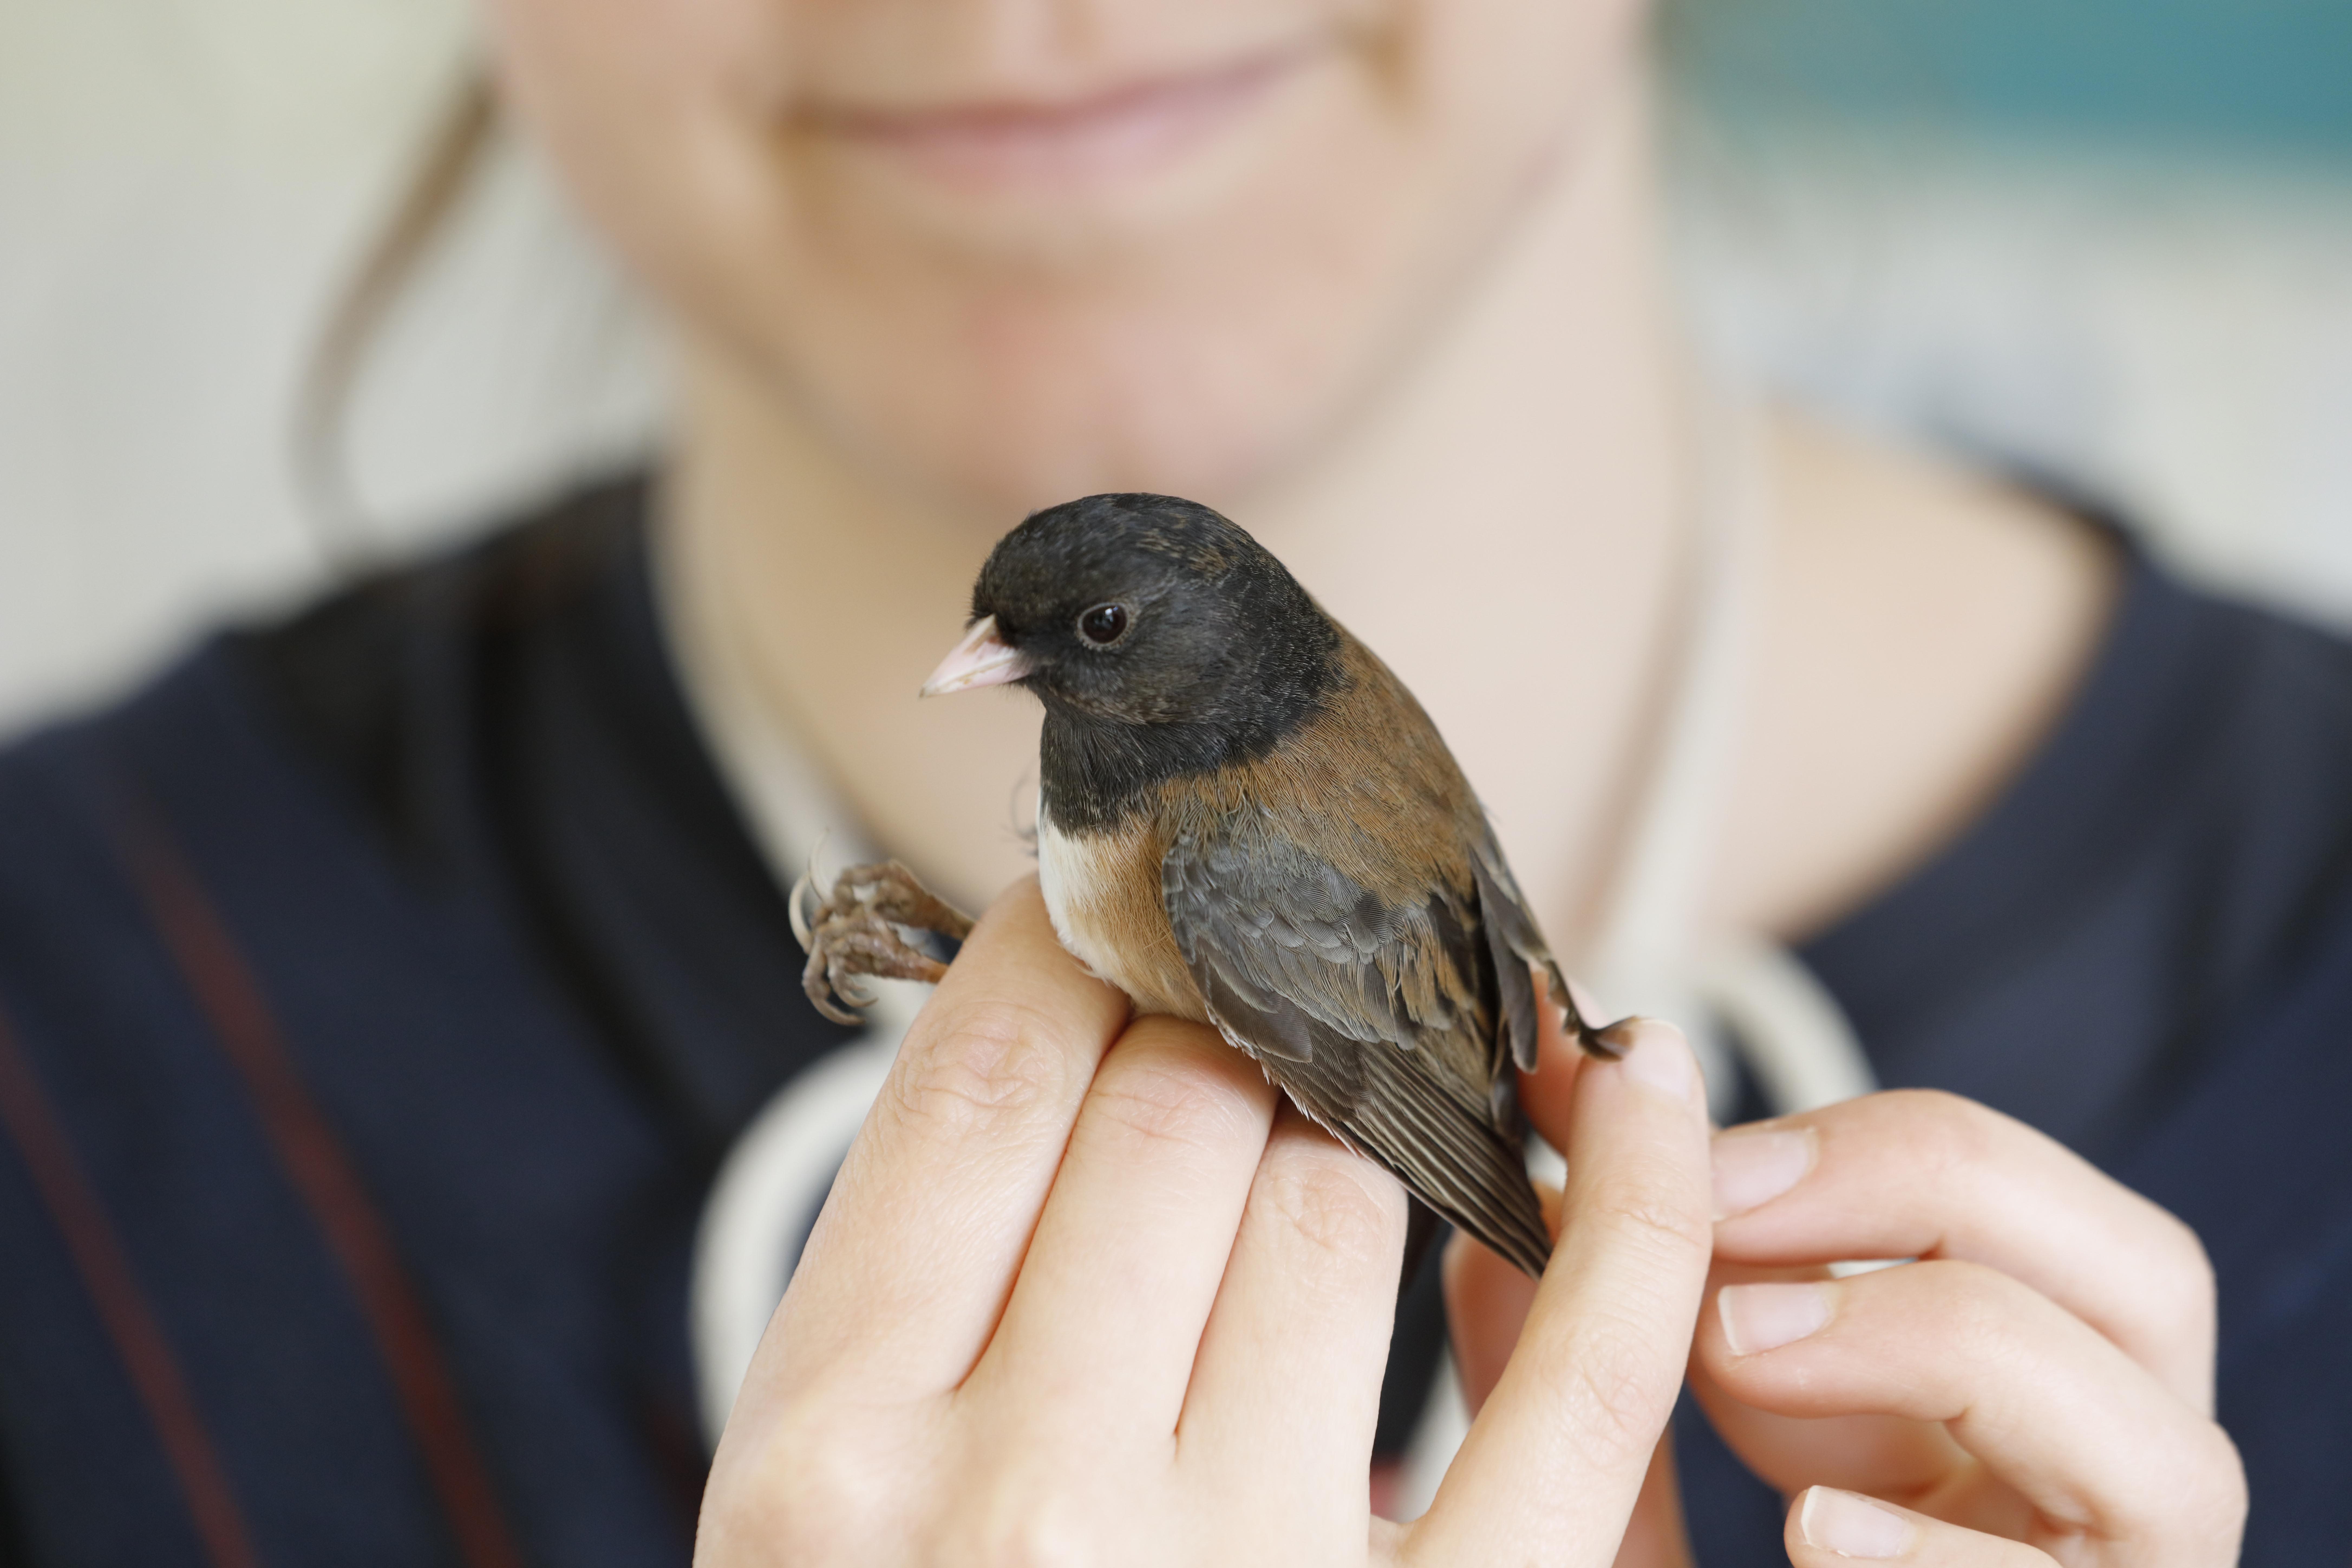 intern holding an Oregon Junco during bird banding procedure